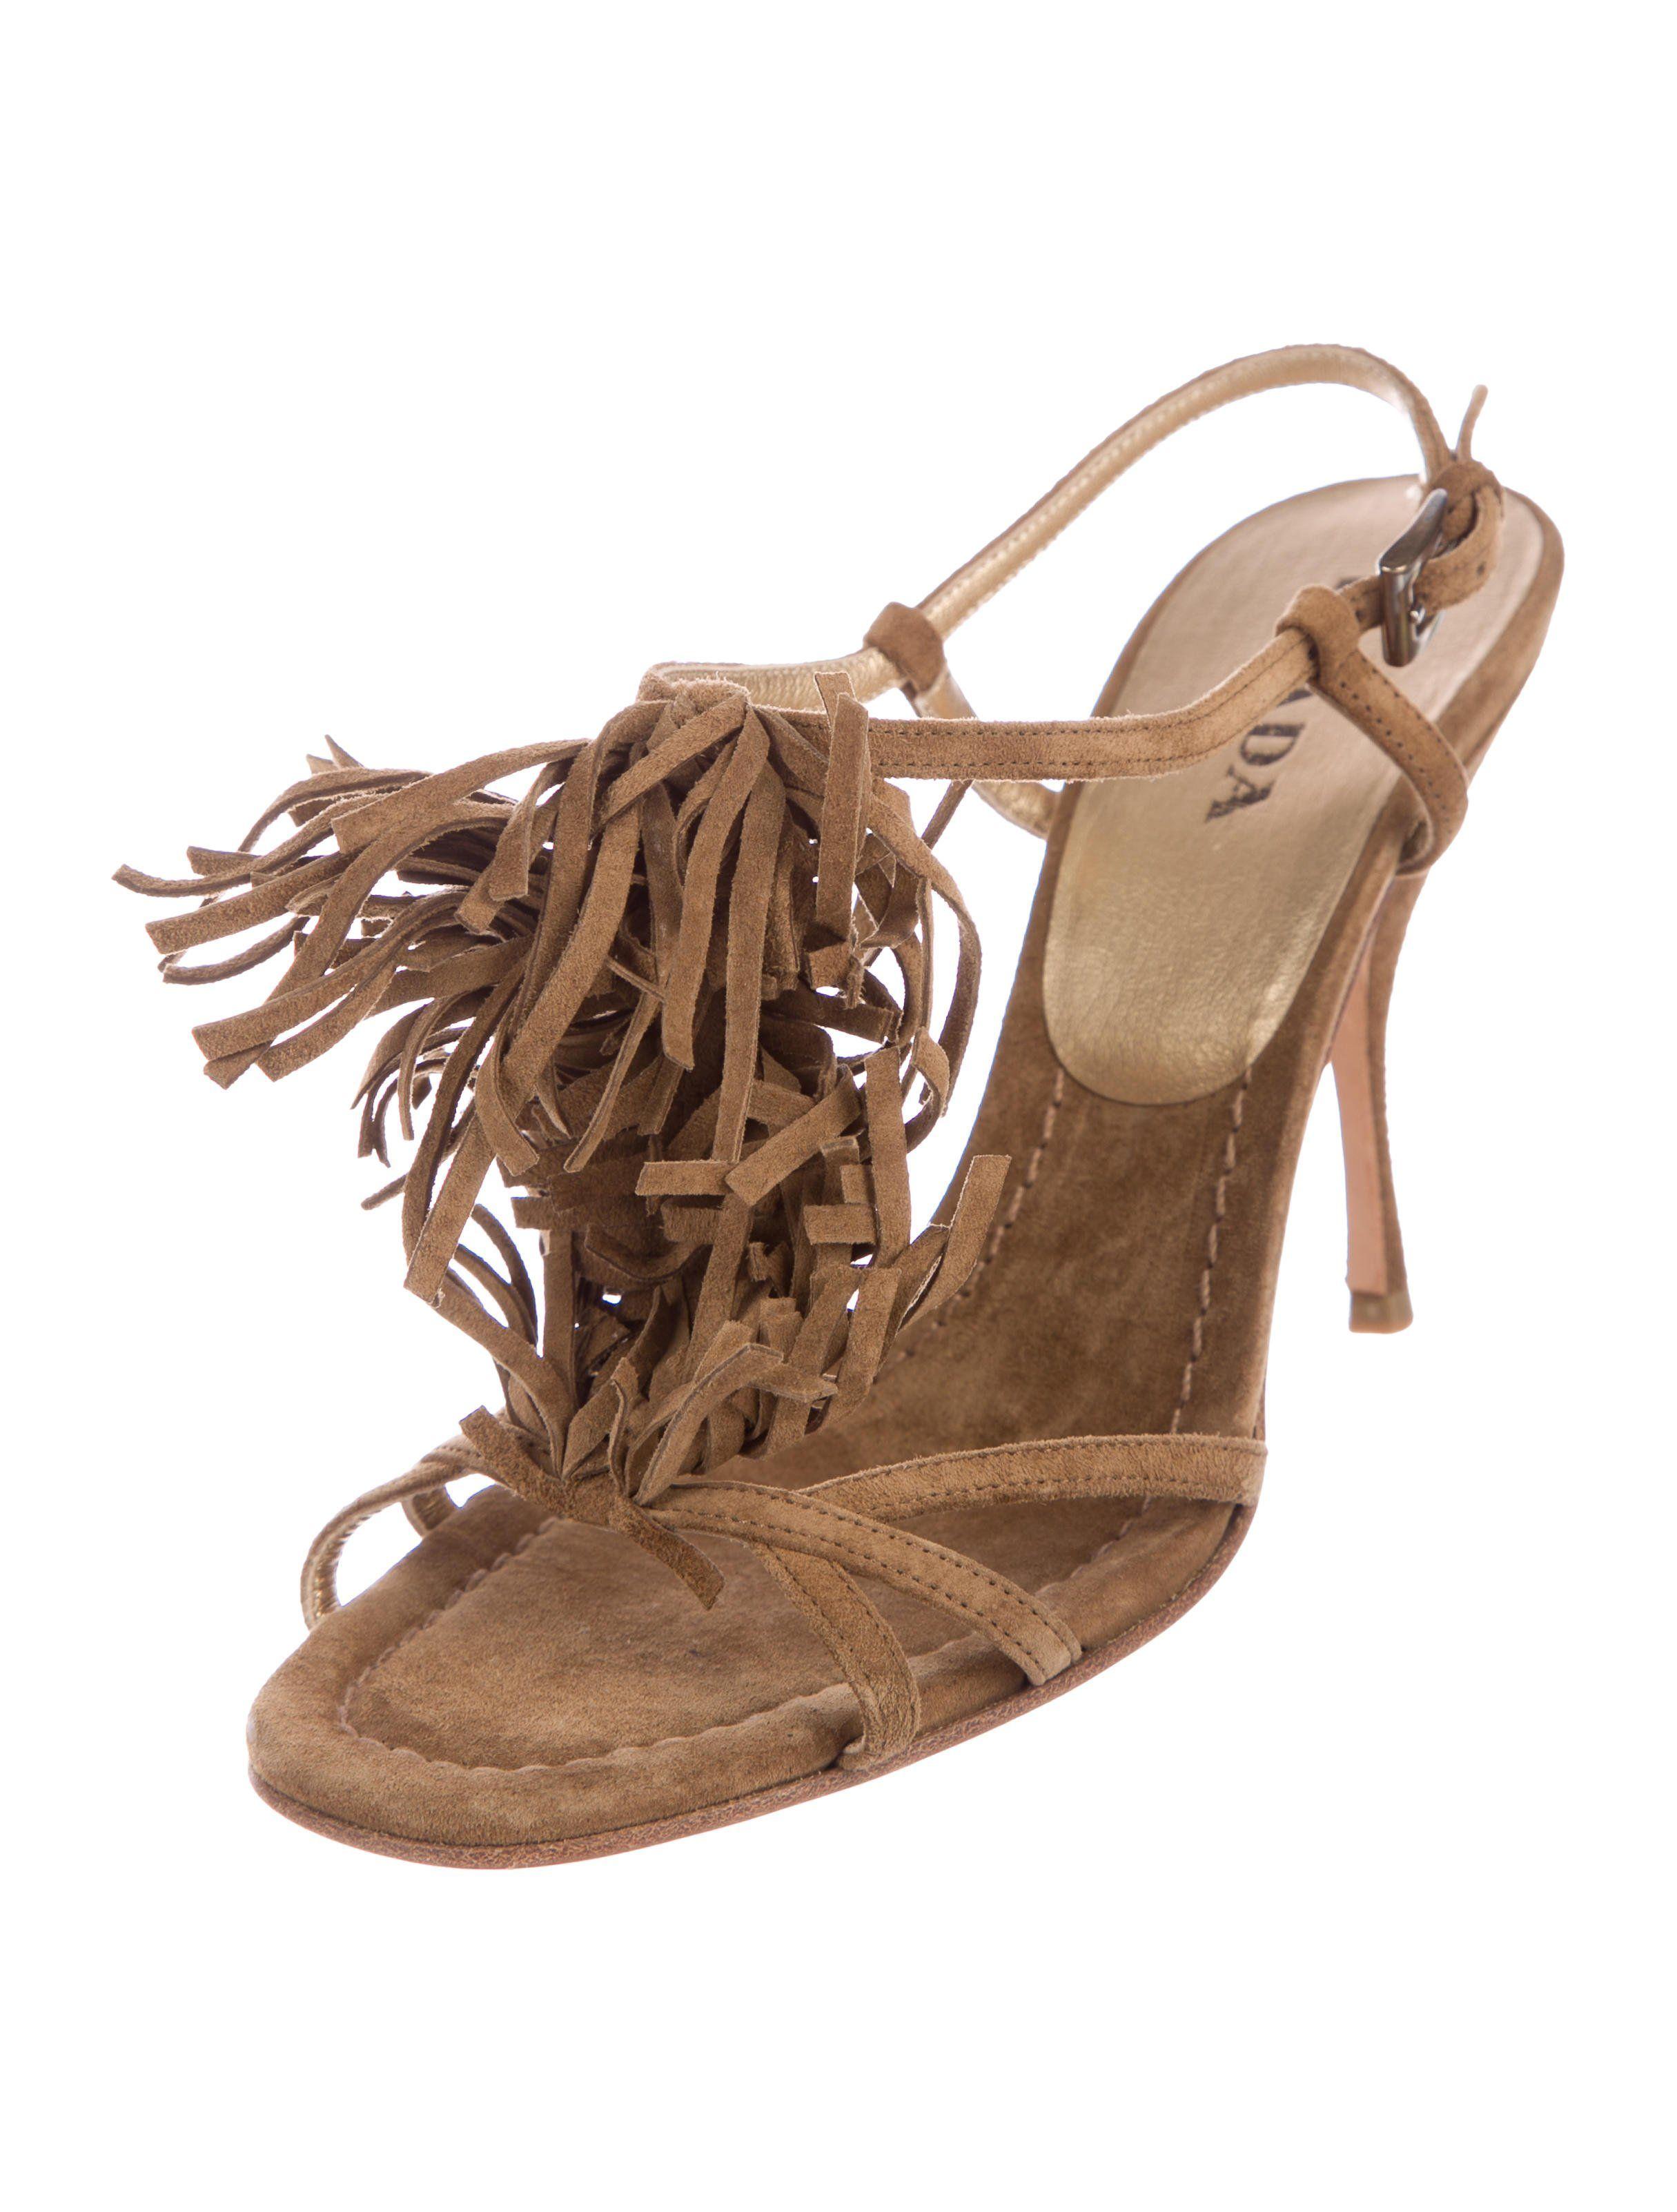 096933f9e537 Light brown suede Prada sandals with fringe trim embellishments at vamps